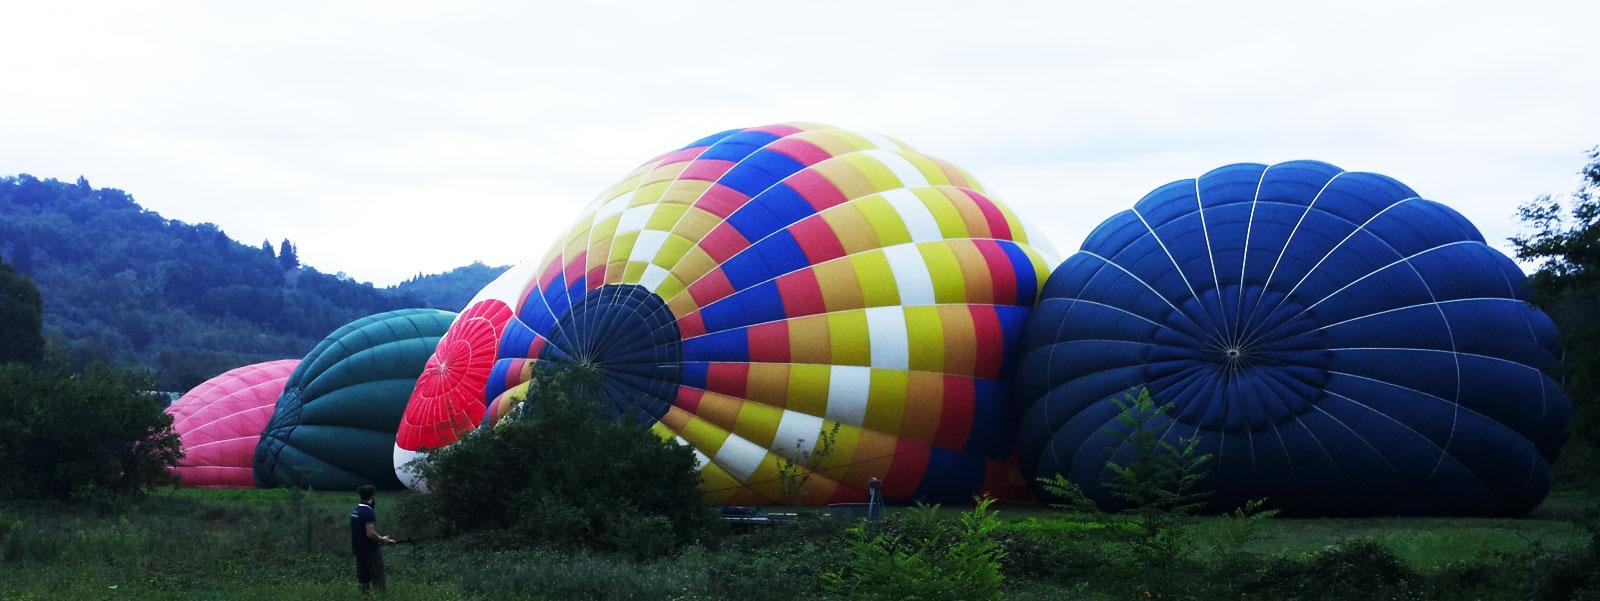 balloon-meet-cold-inflation